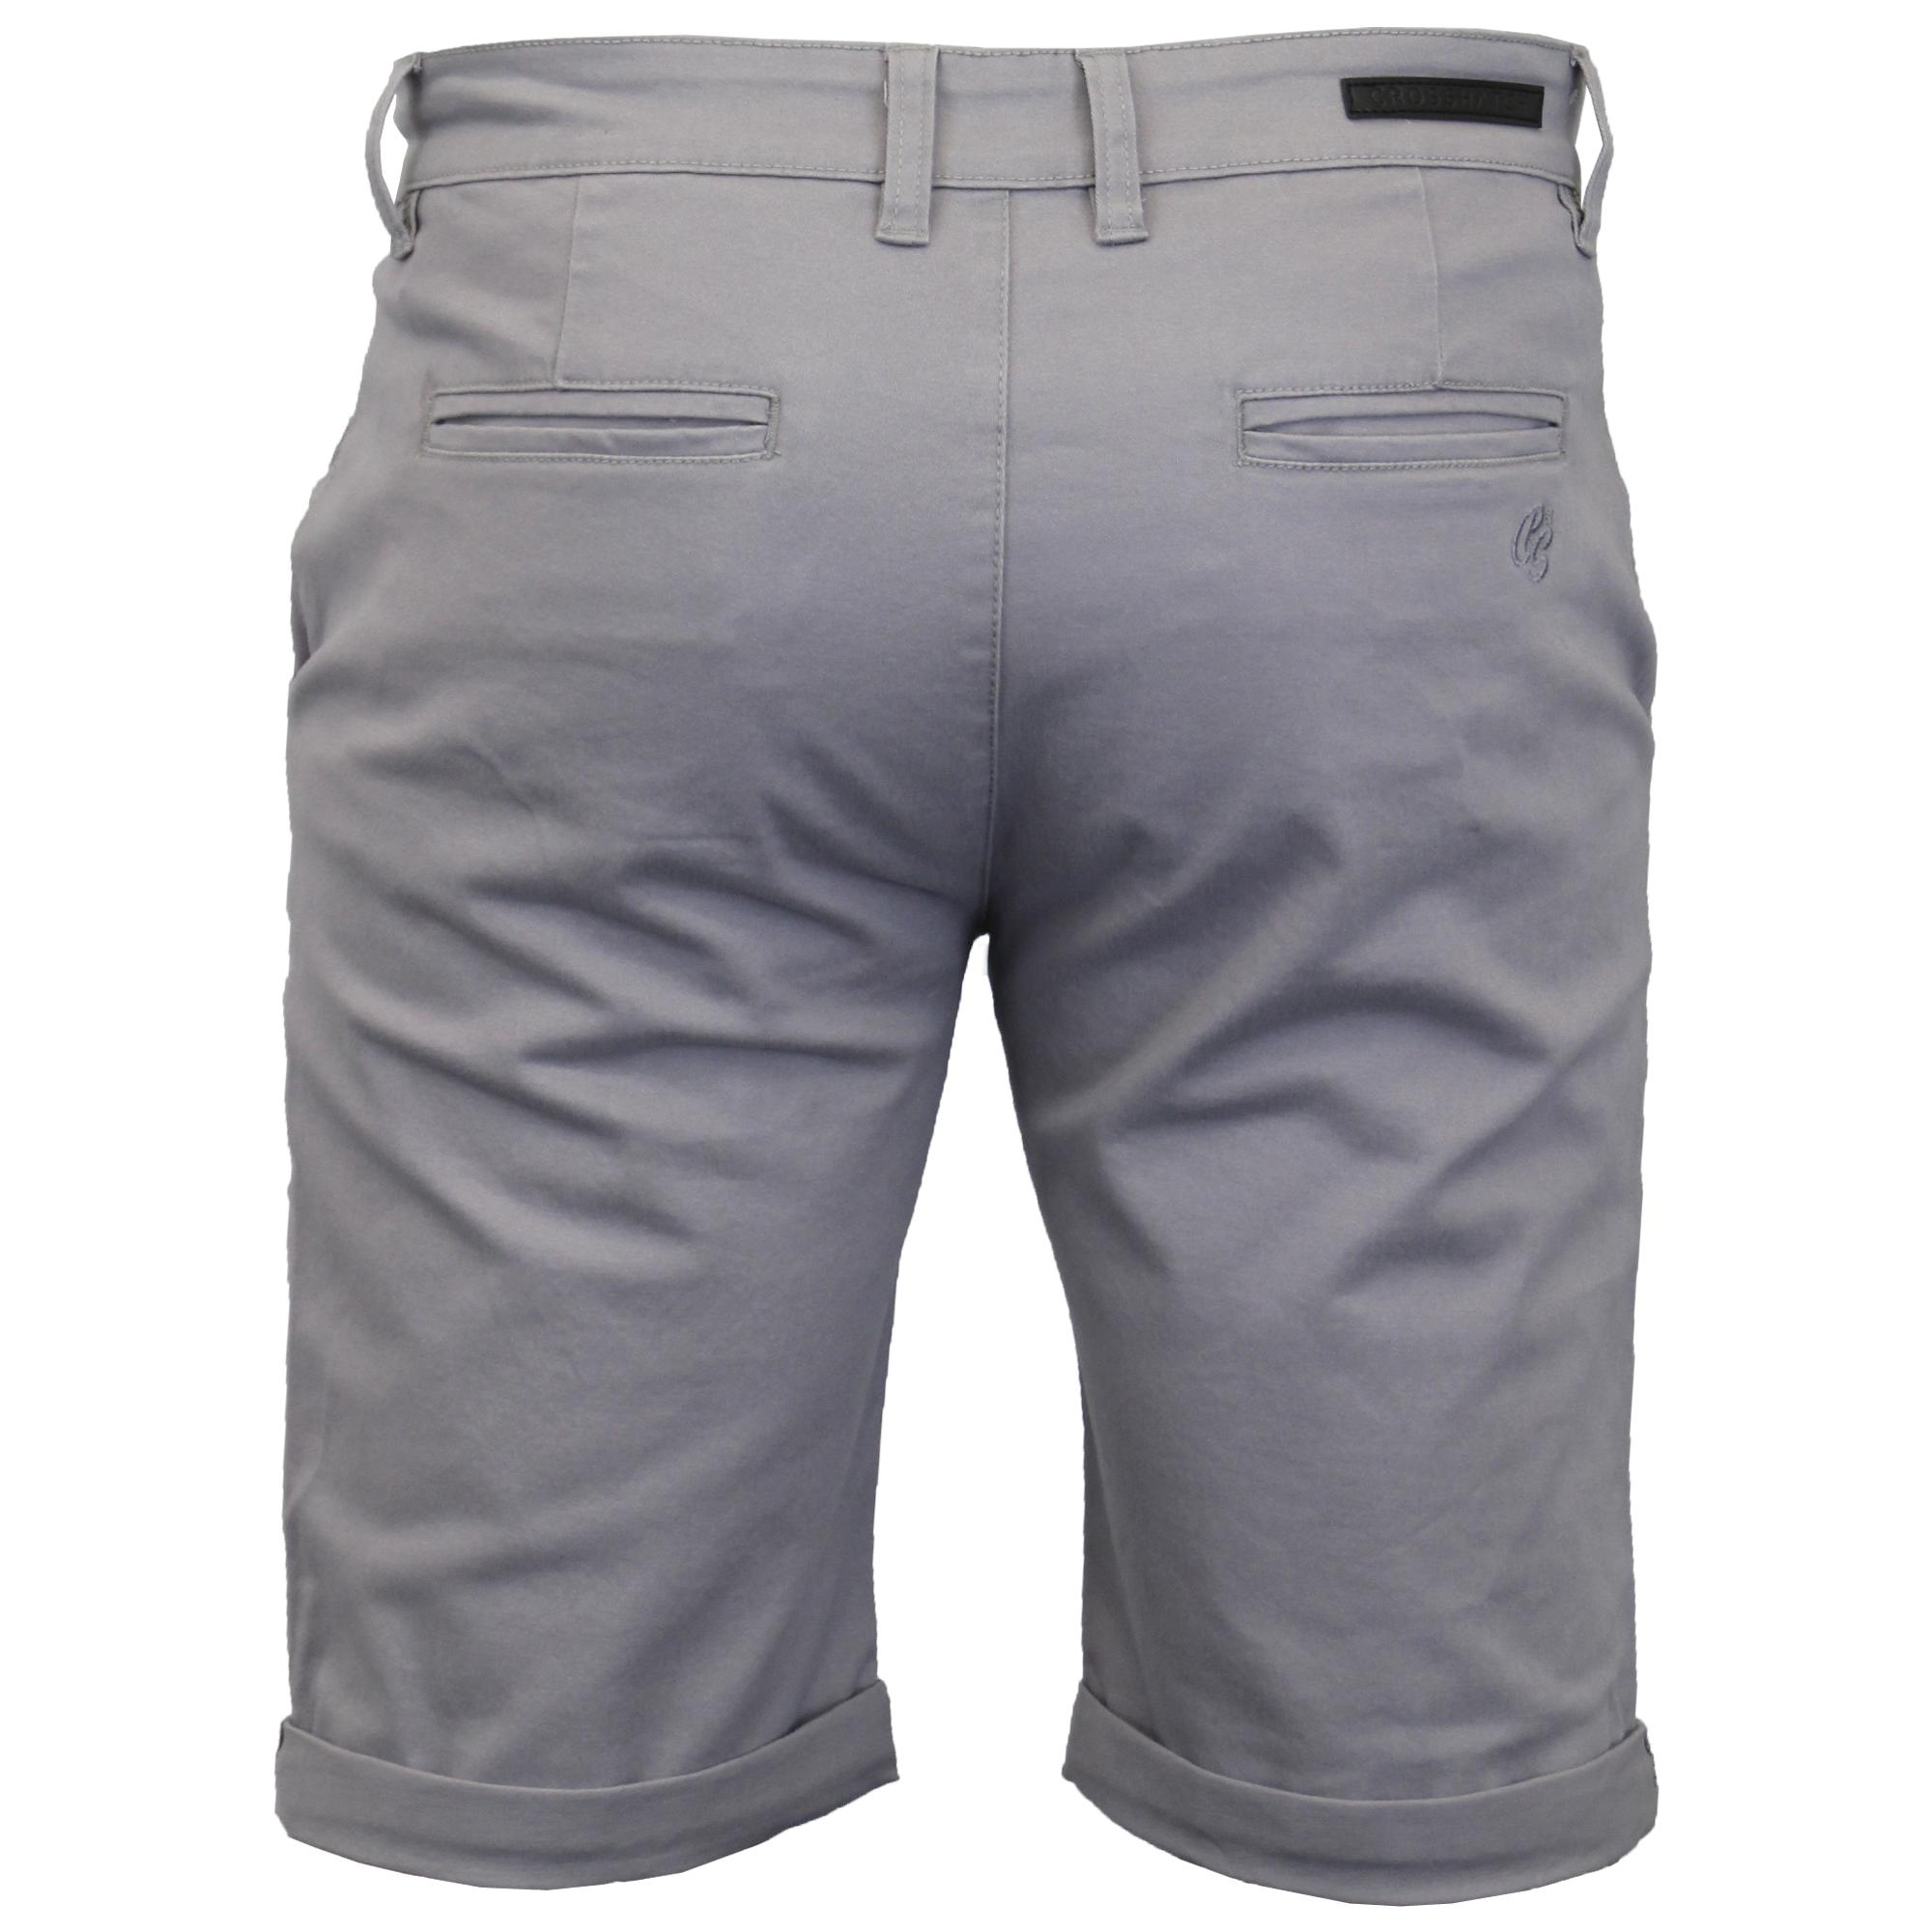 thumbnail 3 - Mens-Chino-Shorts-Crosshatch-Brandons-Knee-Length-Fastrack-Roll-Up-Summer-New